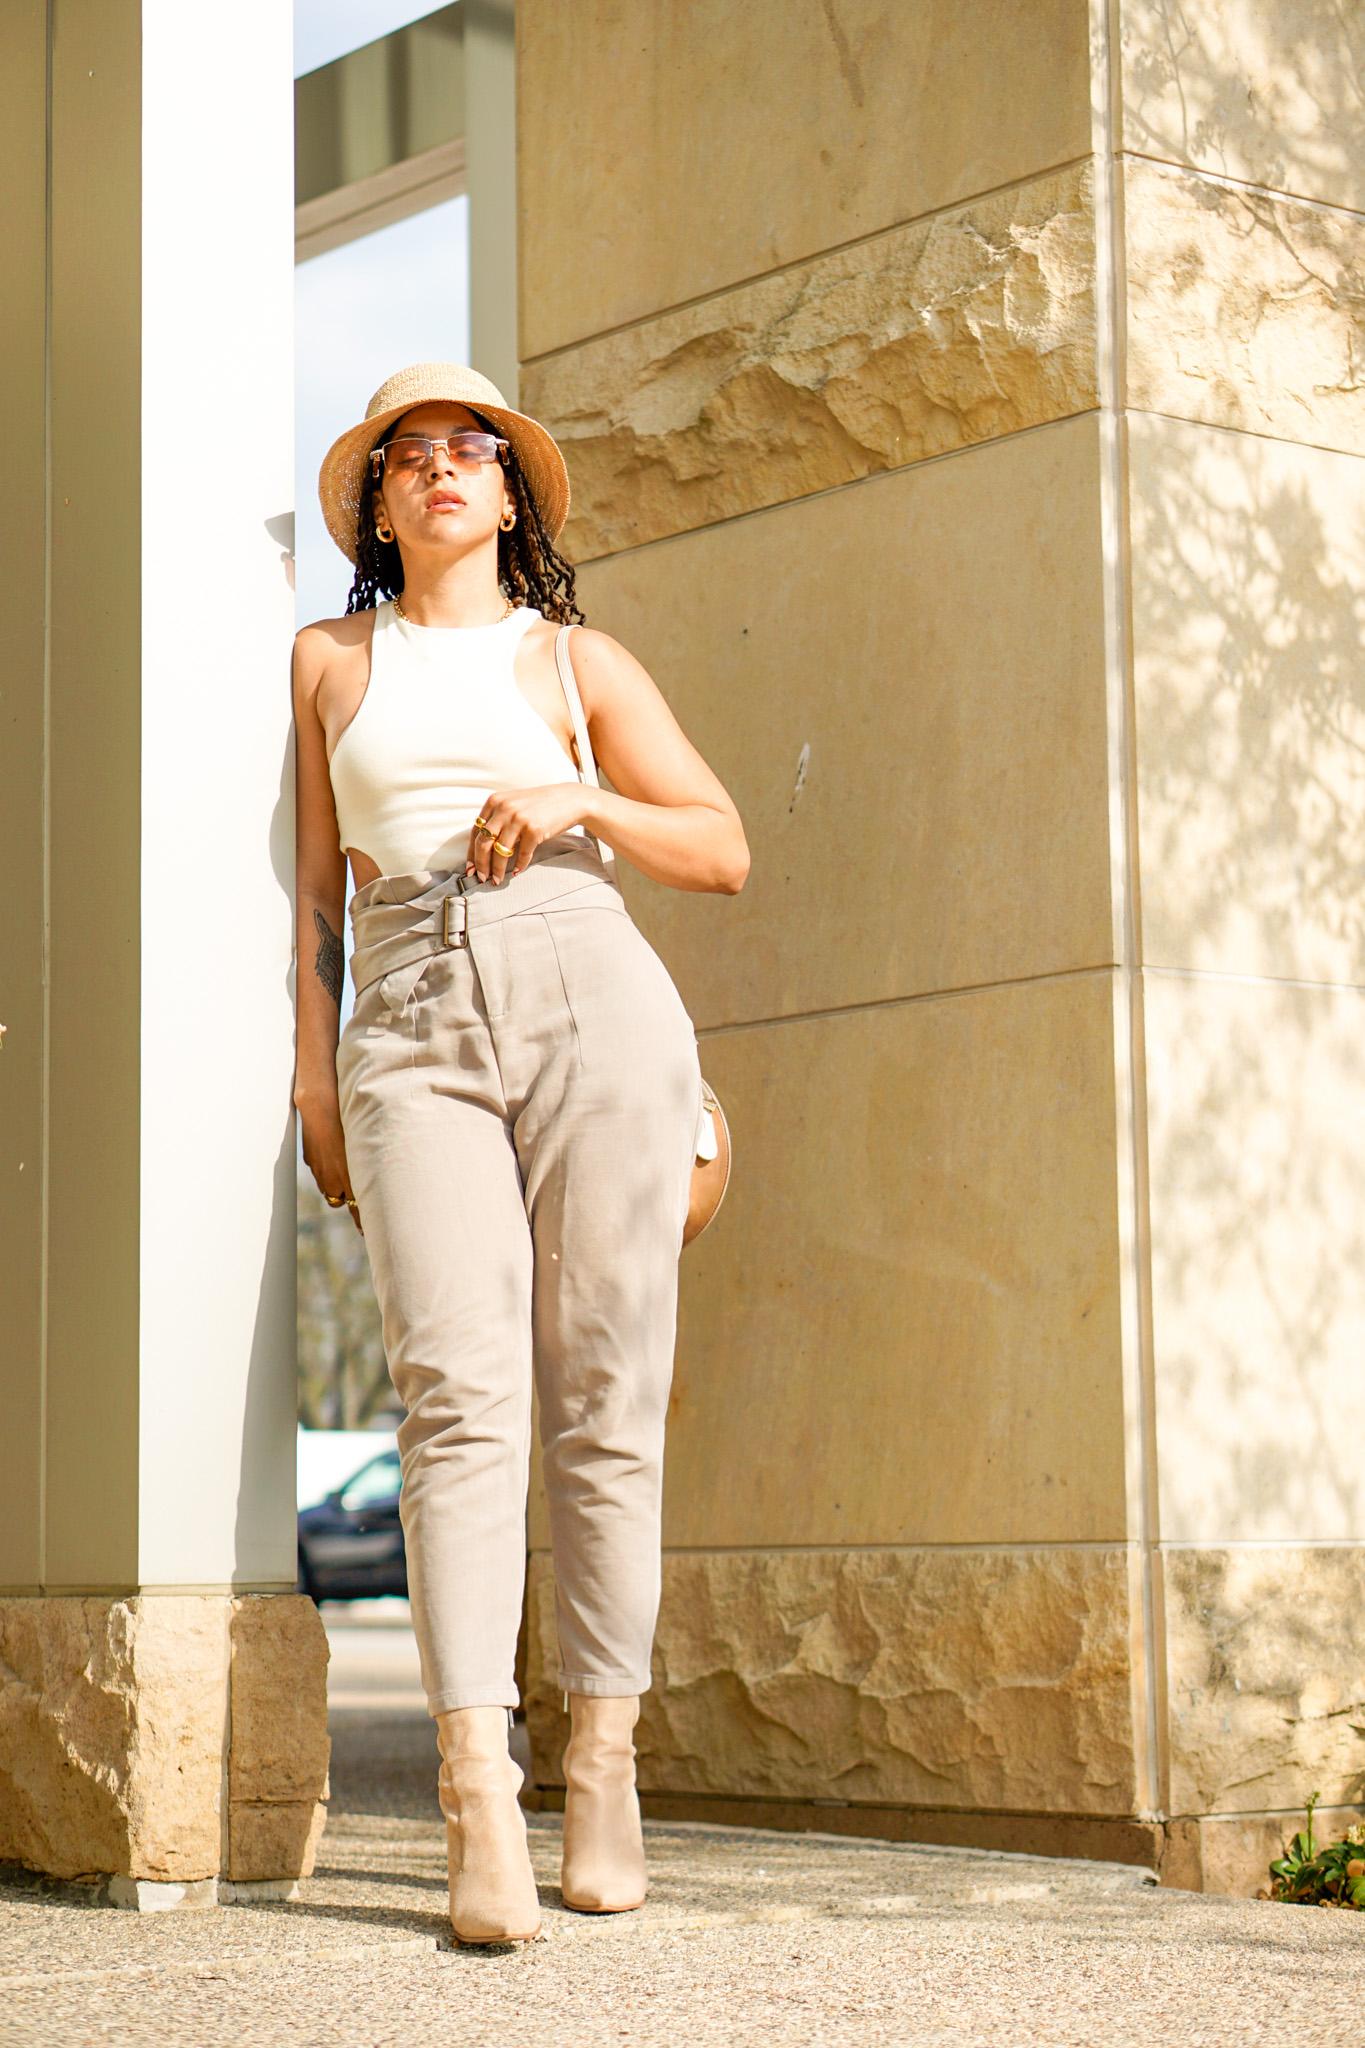 cutout bodysuit outfit ideas, black lifestyle blogger, cutout bodysuit outfit street style, summer outfit black girl, spring fashion, cutout bodysuit outfits black girl